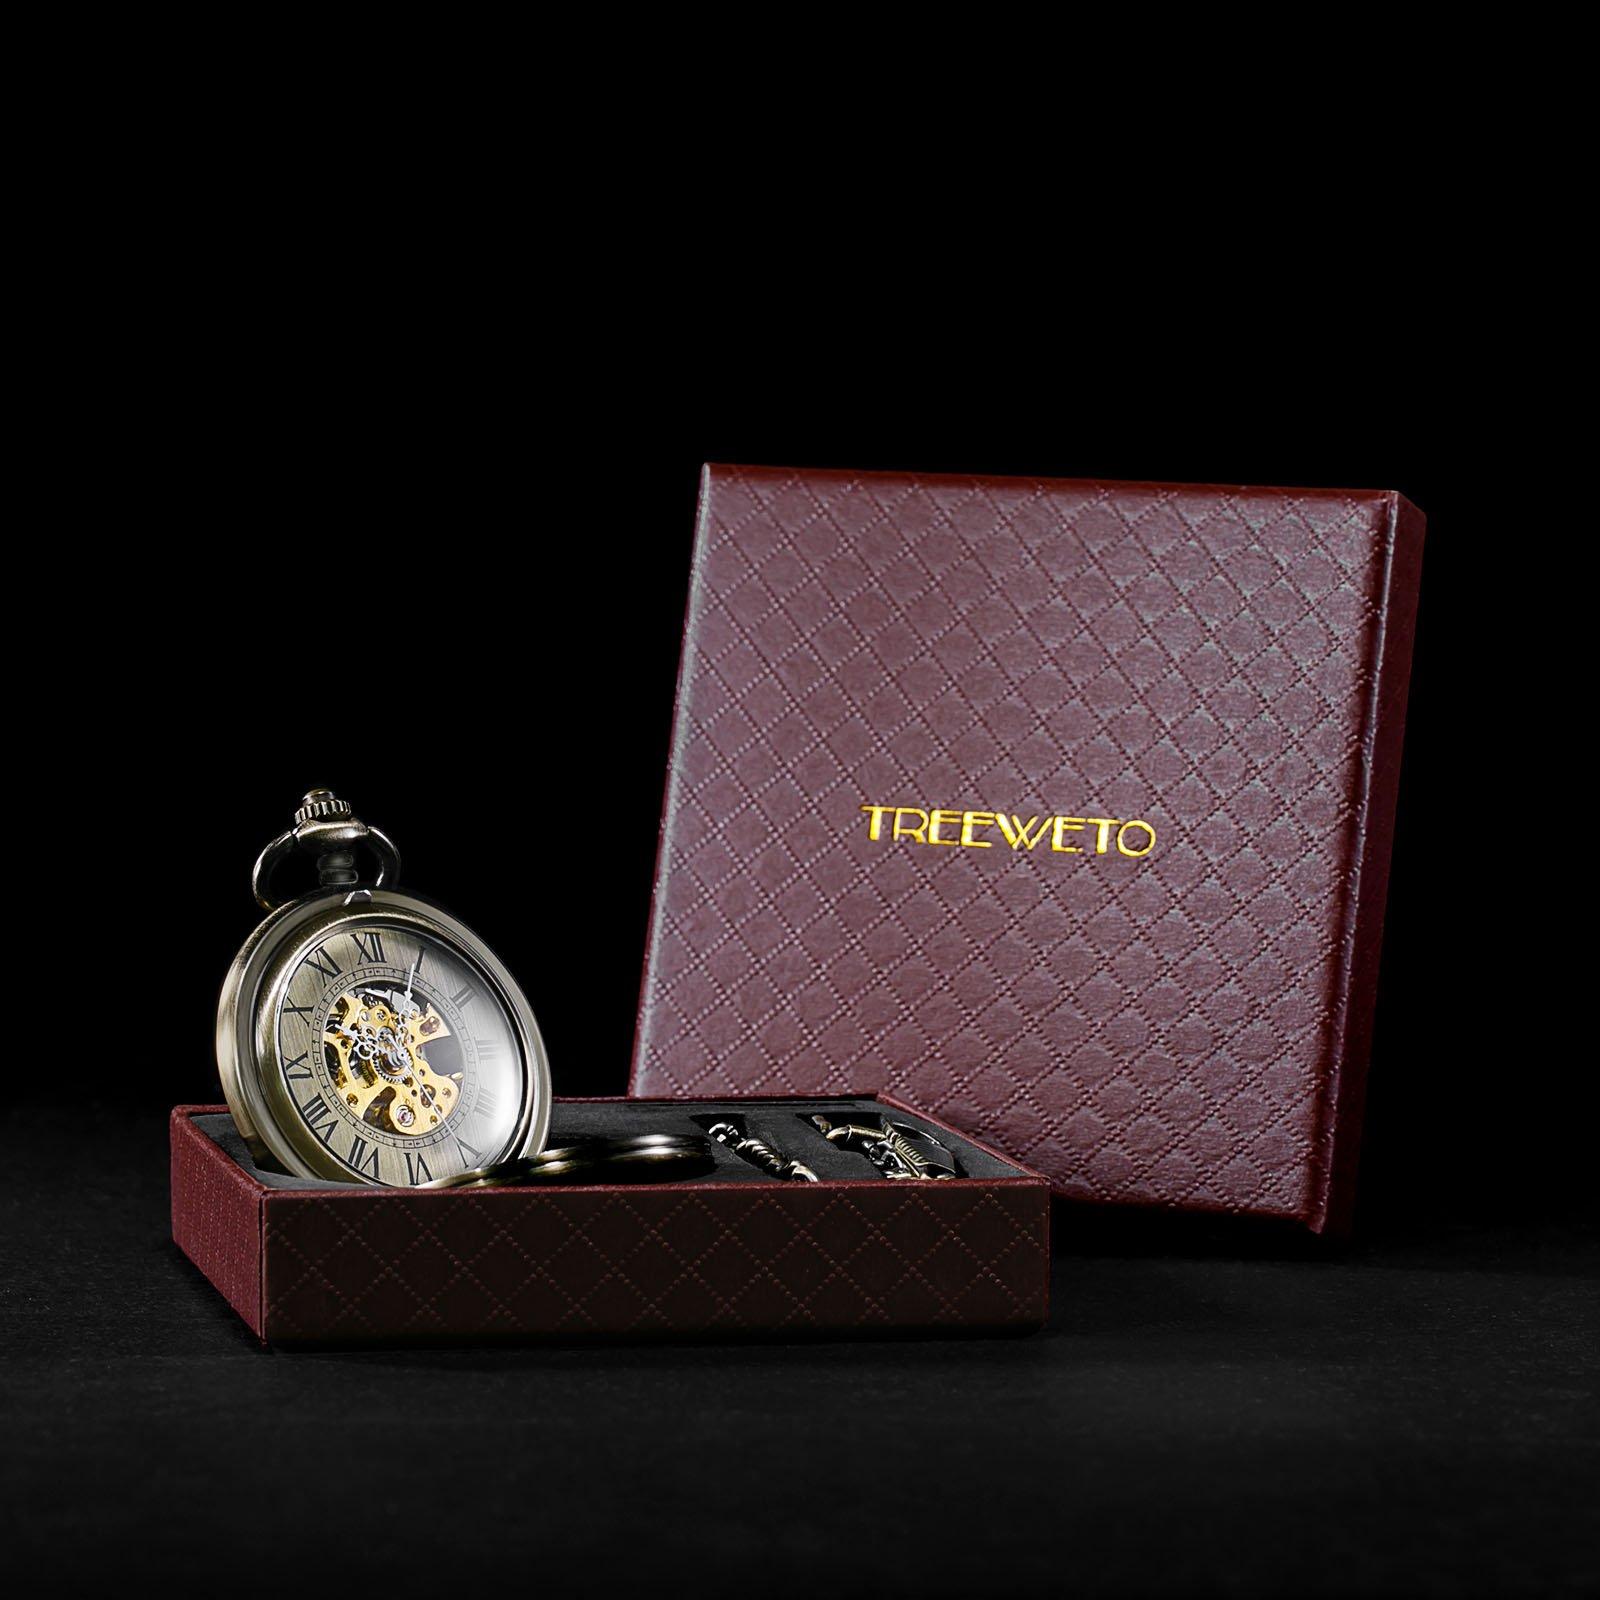 Treeweto Automatic Mechanical Pocket Watch Half Hunter Case Steampunk Skeleton Dial for Men Women